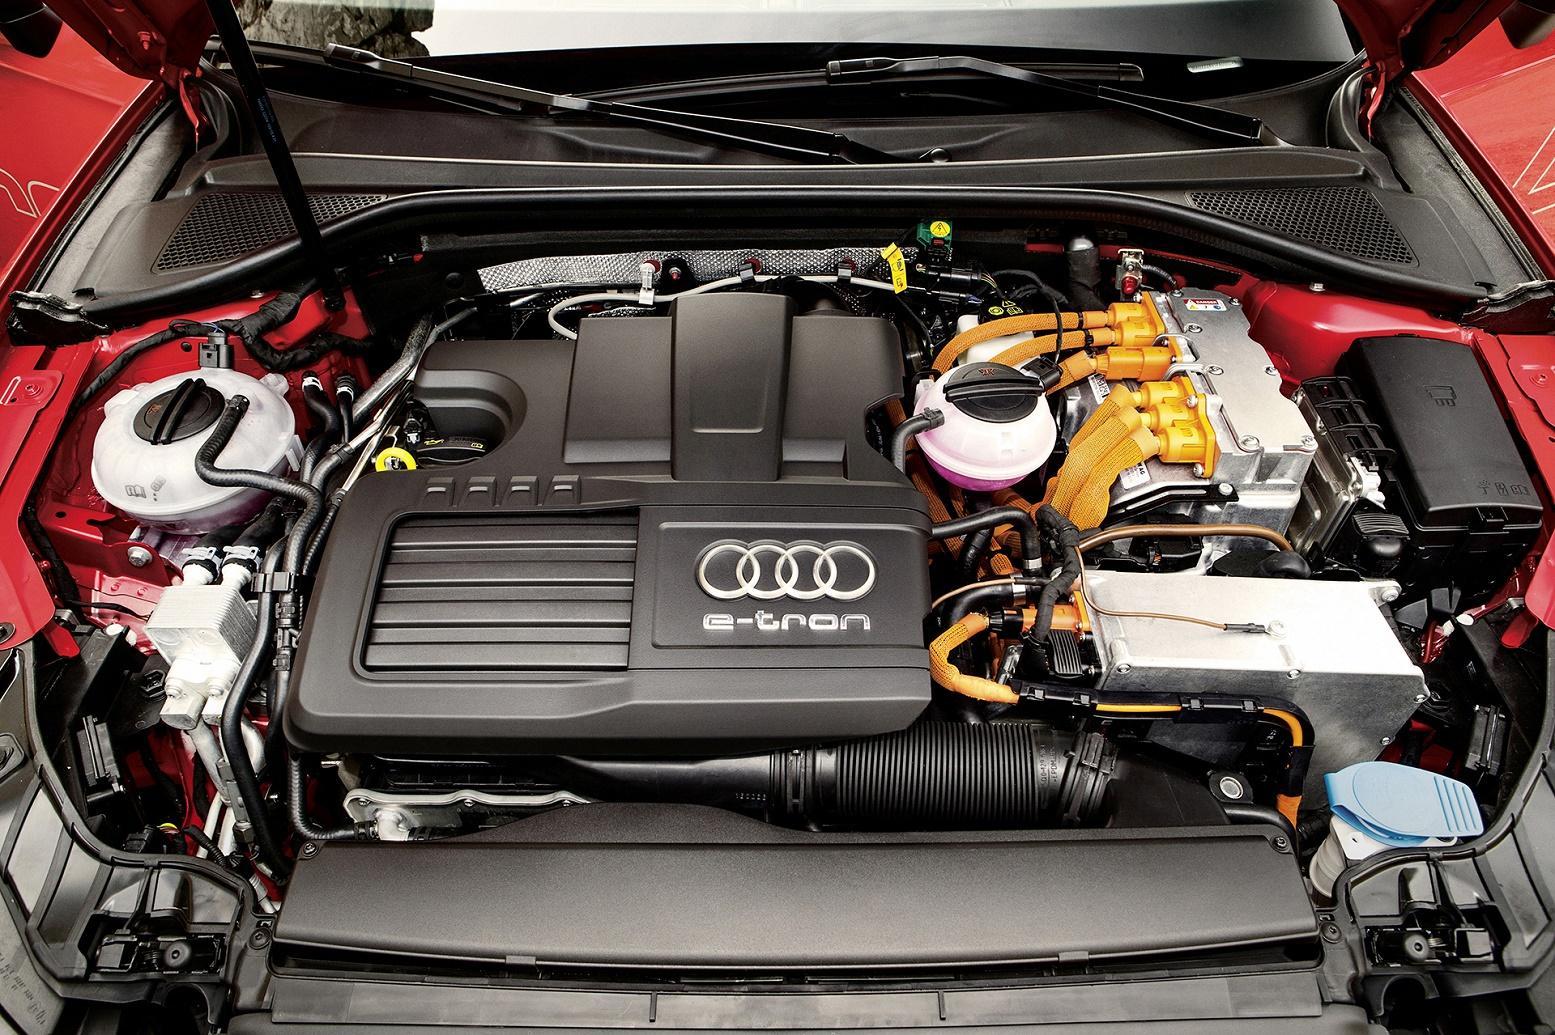 Audi-E-tron-8